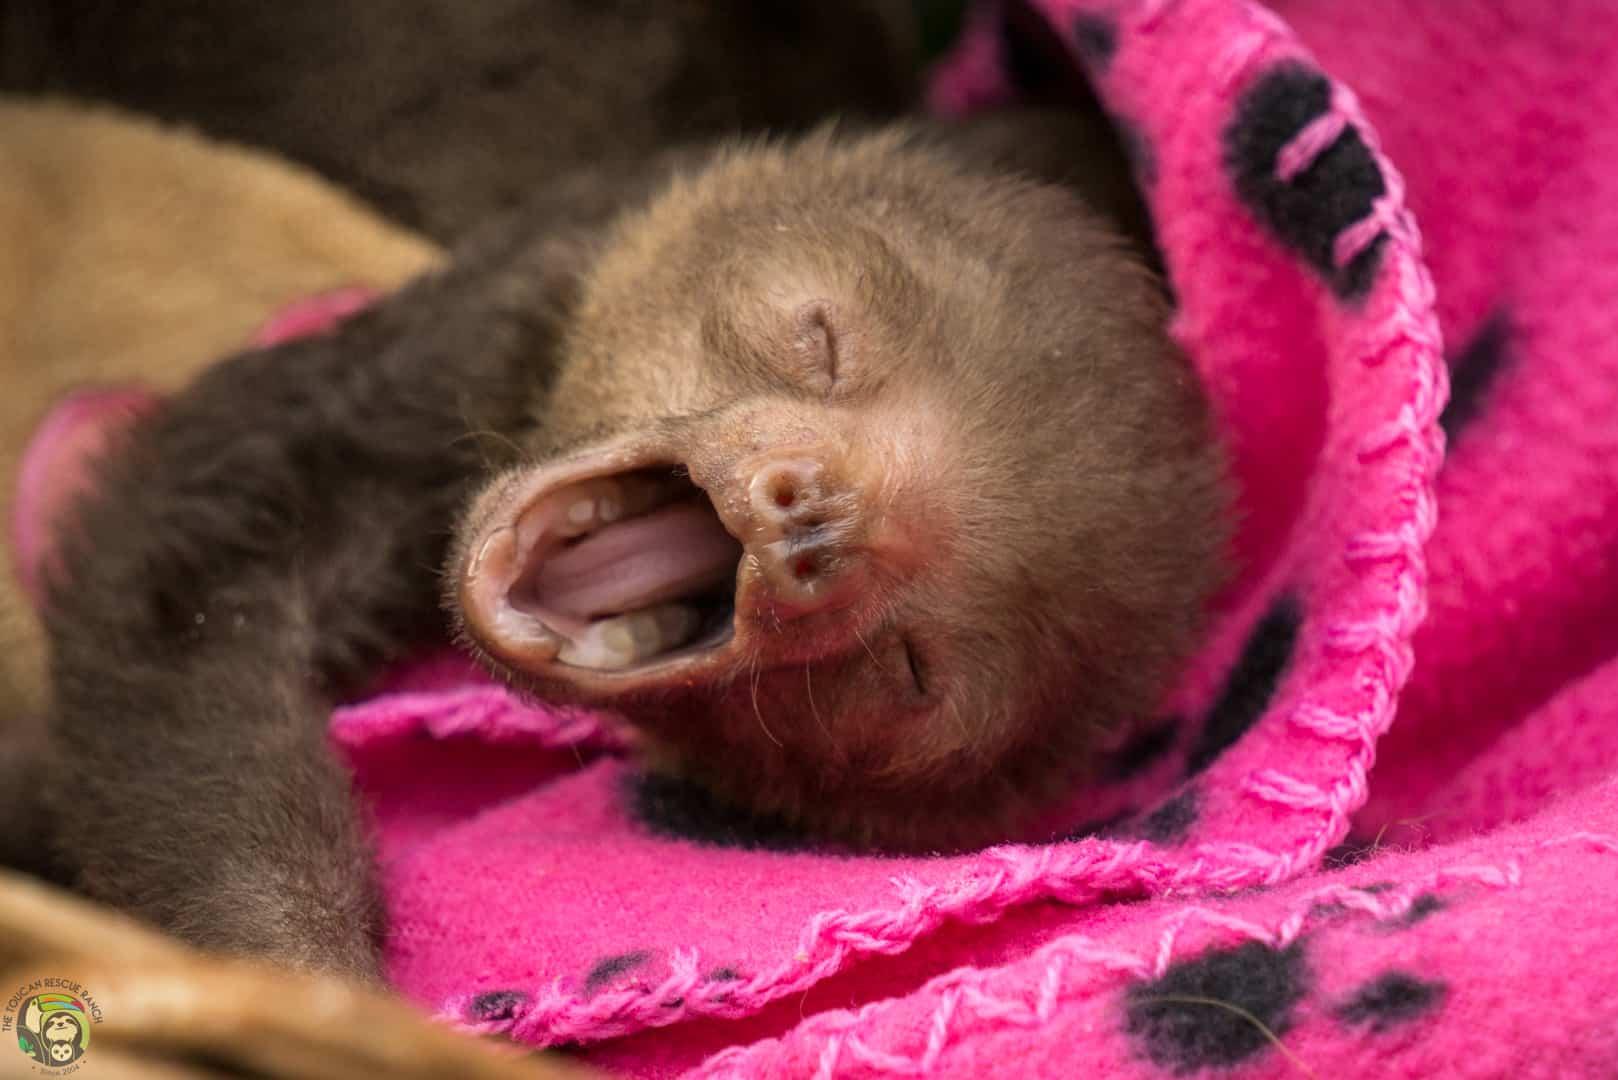 Rolo the sloth in Costa Rica